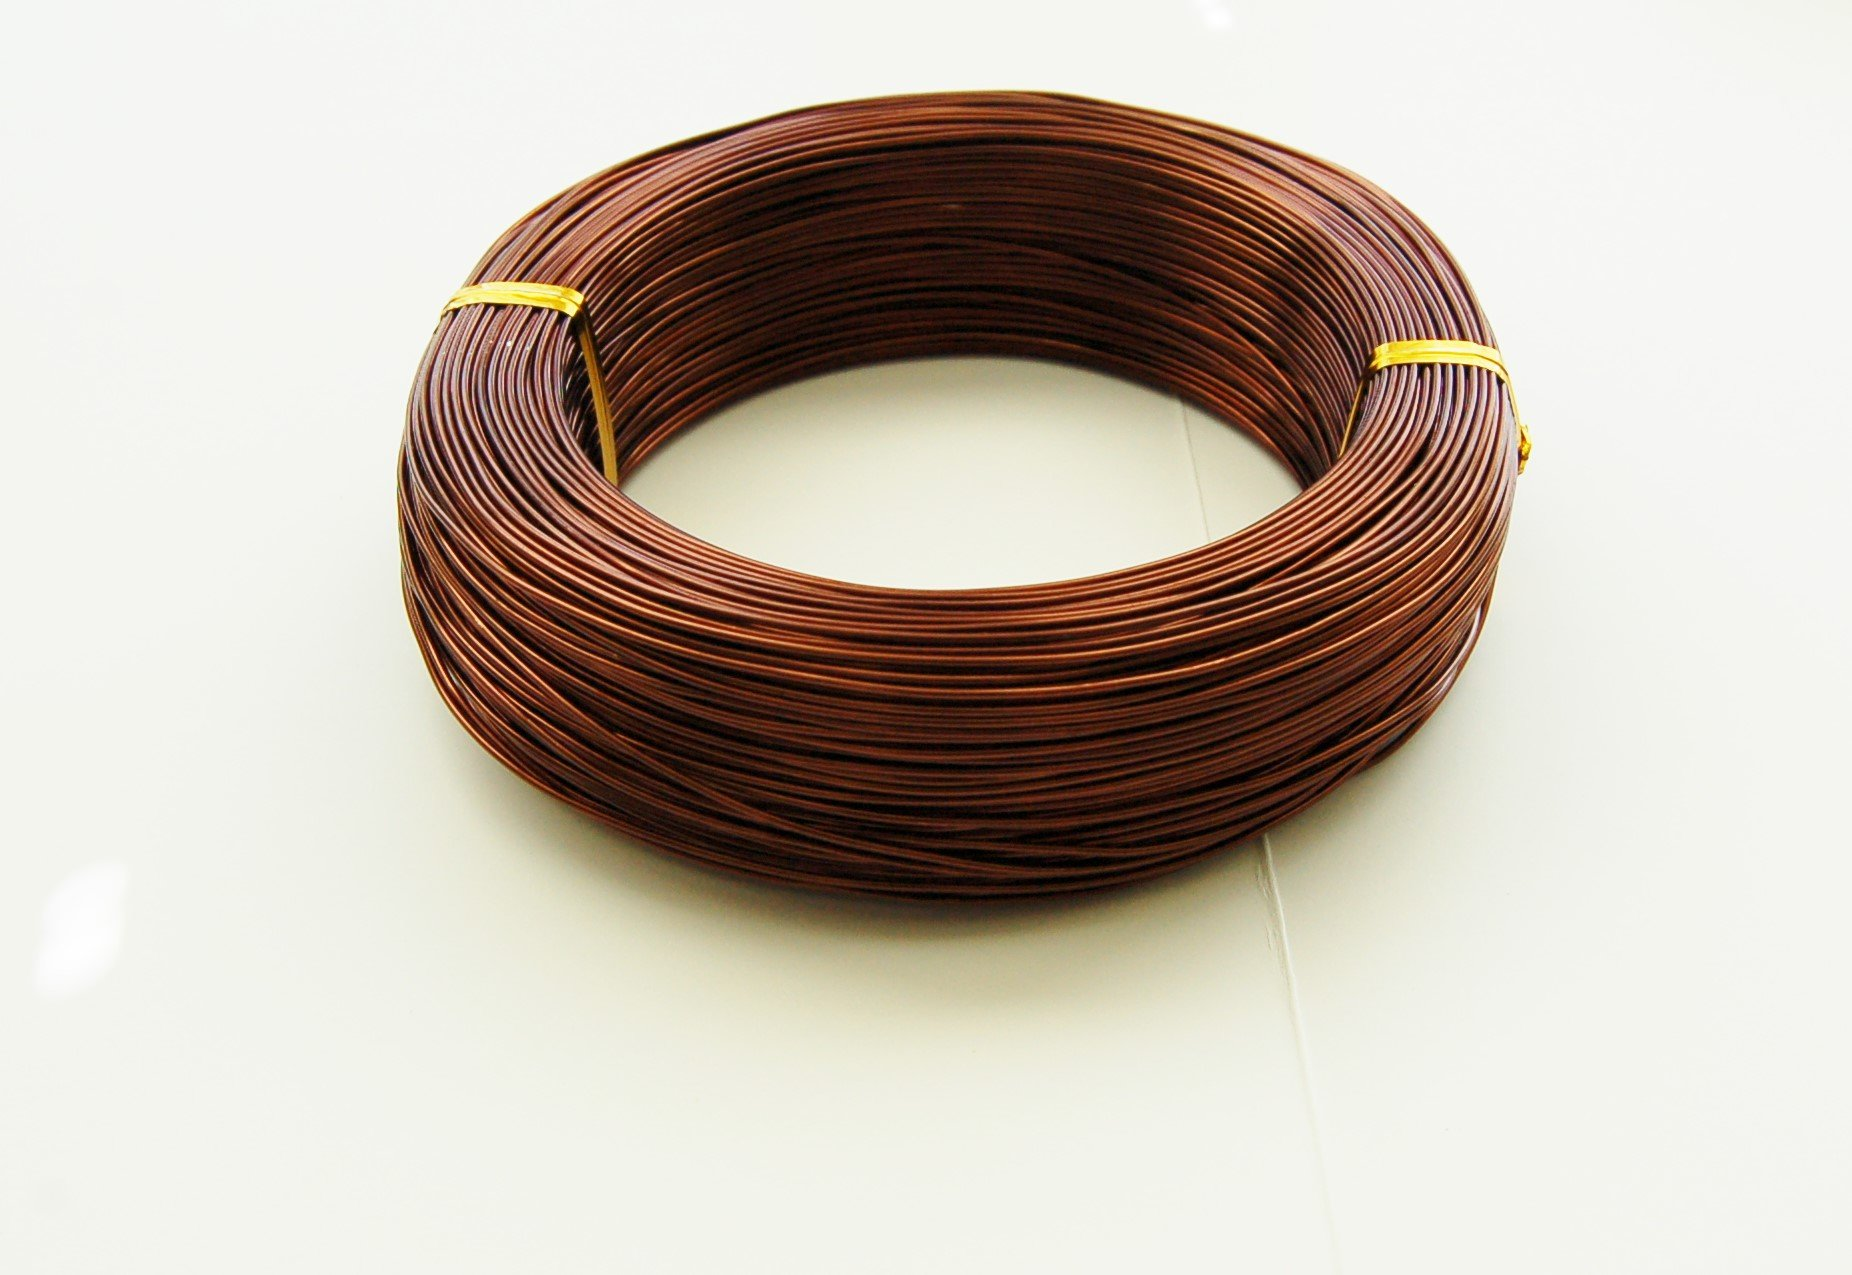 U-nitt Bonsai Tree Training Wires: 250-gram Roll: 1.0mm/387ft